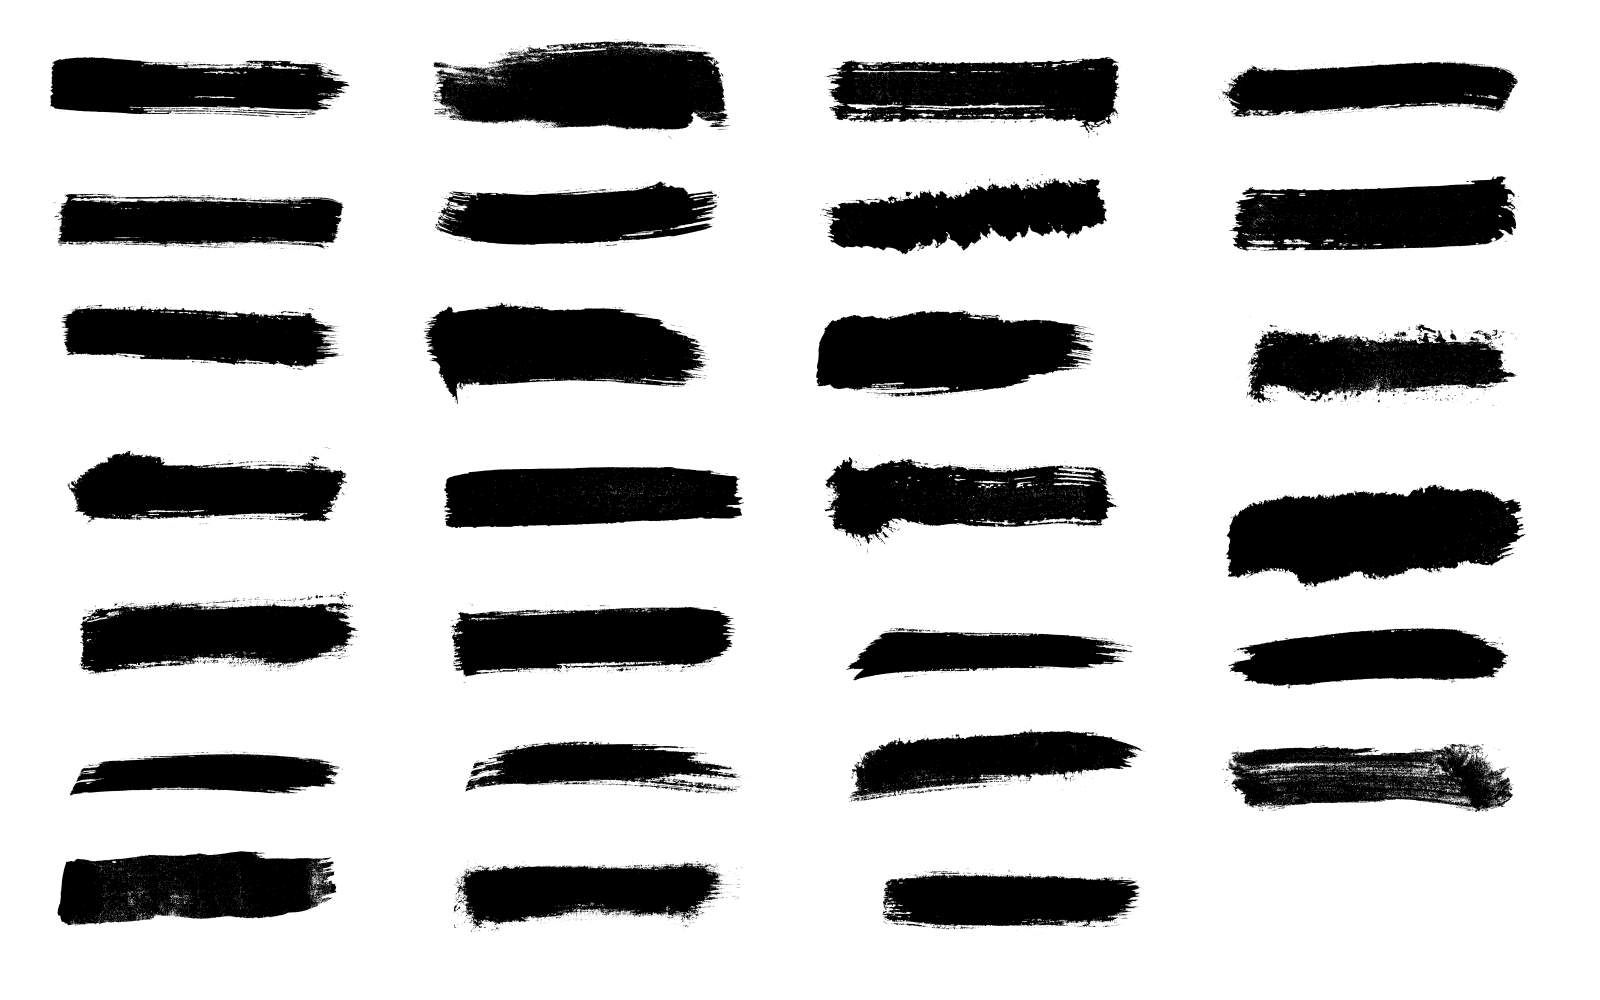 Resolution 3080 732 Px File Format Png File Size 91 39 Kb Free Download Grunge Brush Stroke Banner 2 1 Png Resolution 3080 Brush Strokes Grunge Brush